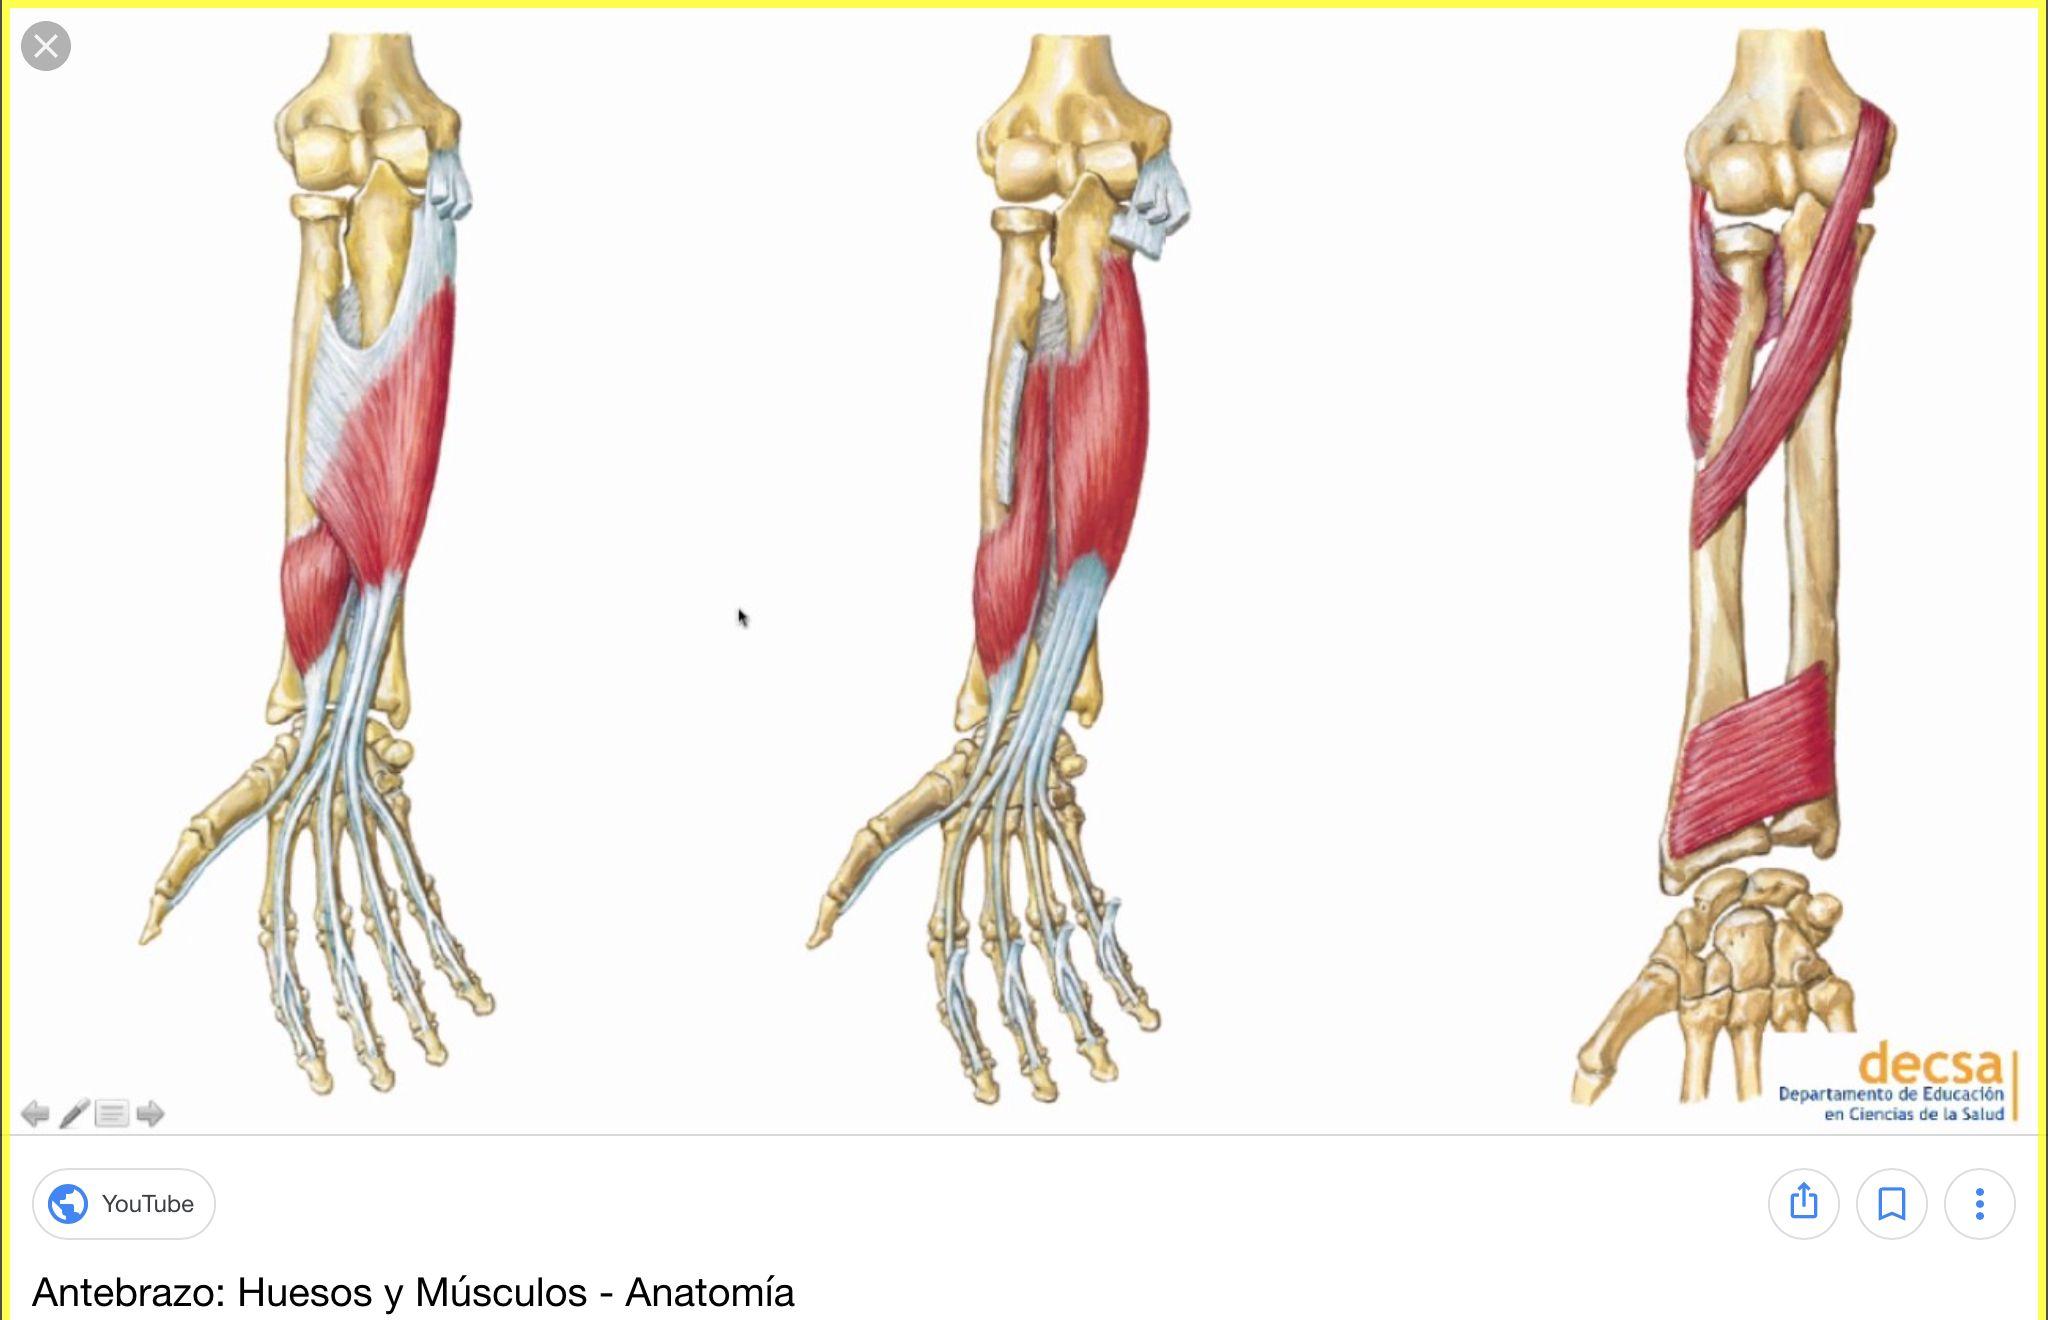 anatomia de miembro superior - Buscar con Google | Anatomia ...